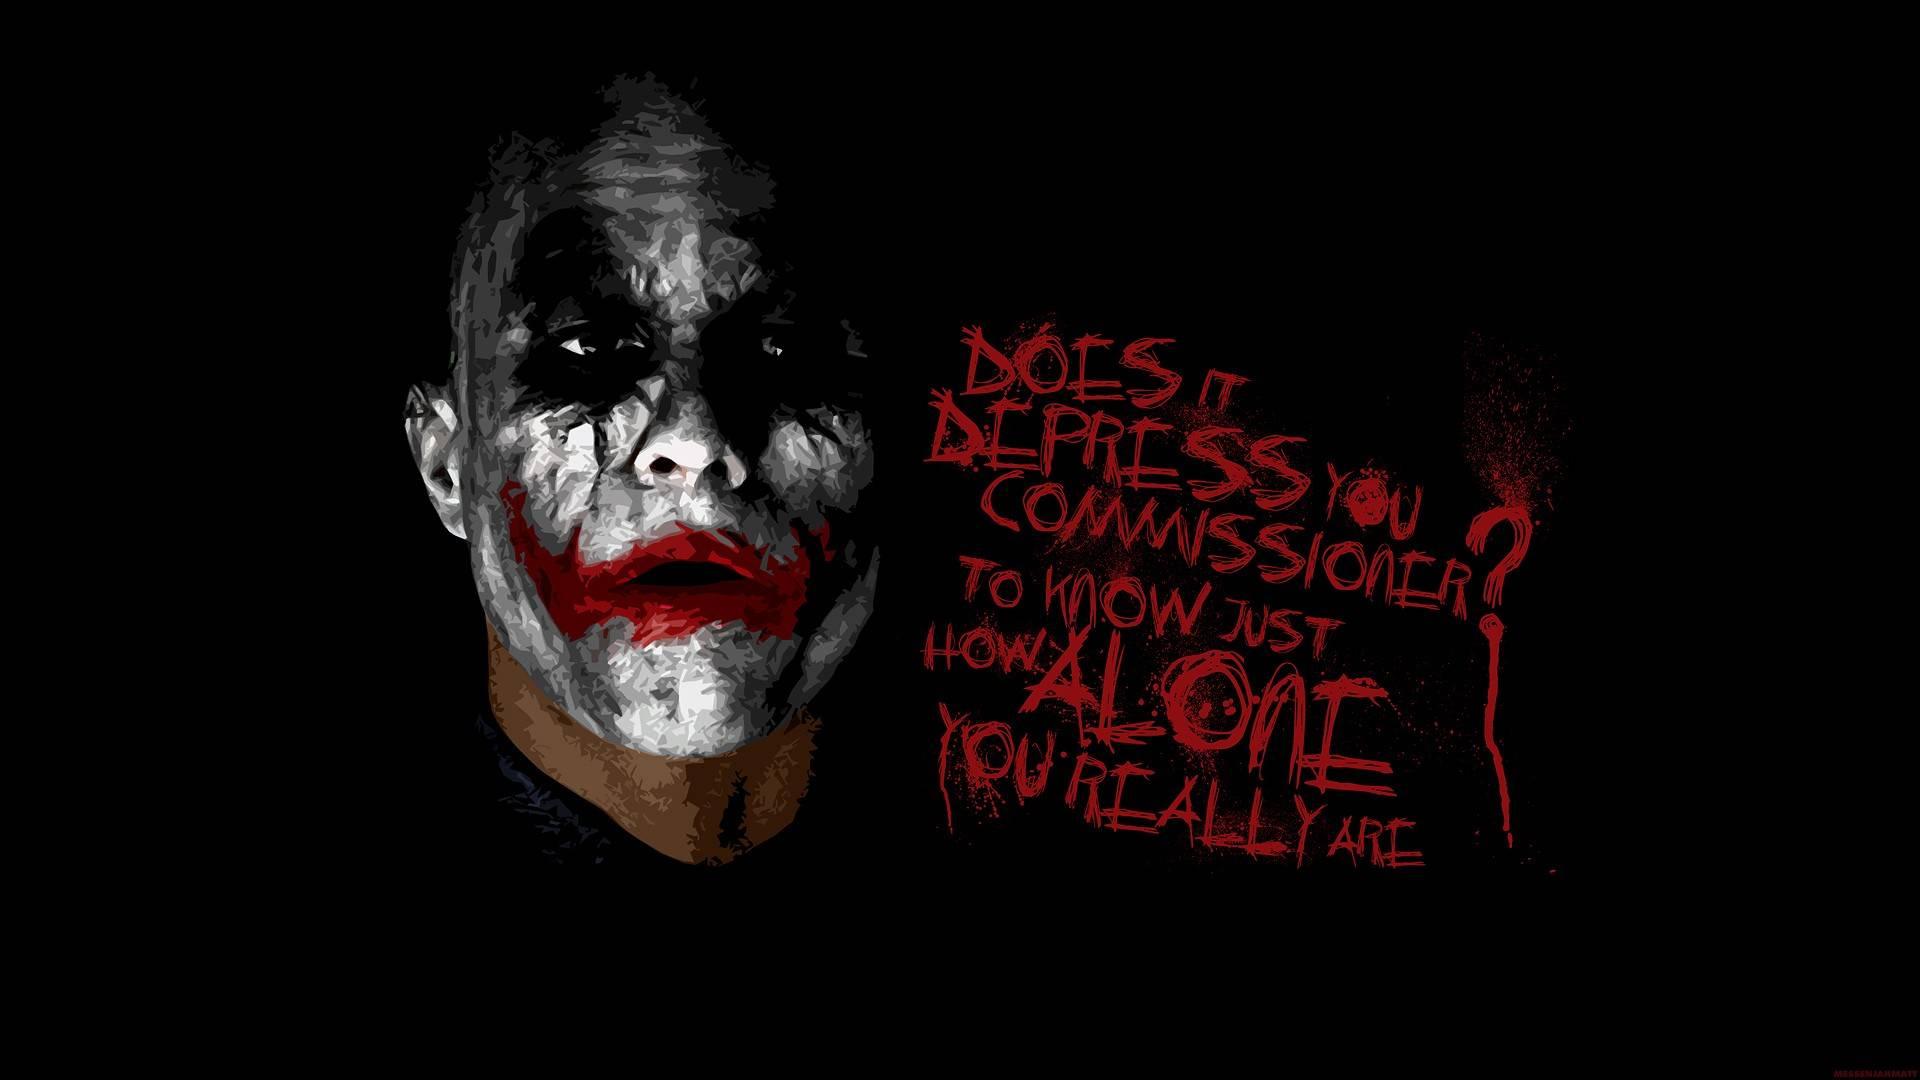 Batman quote #2